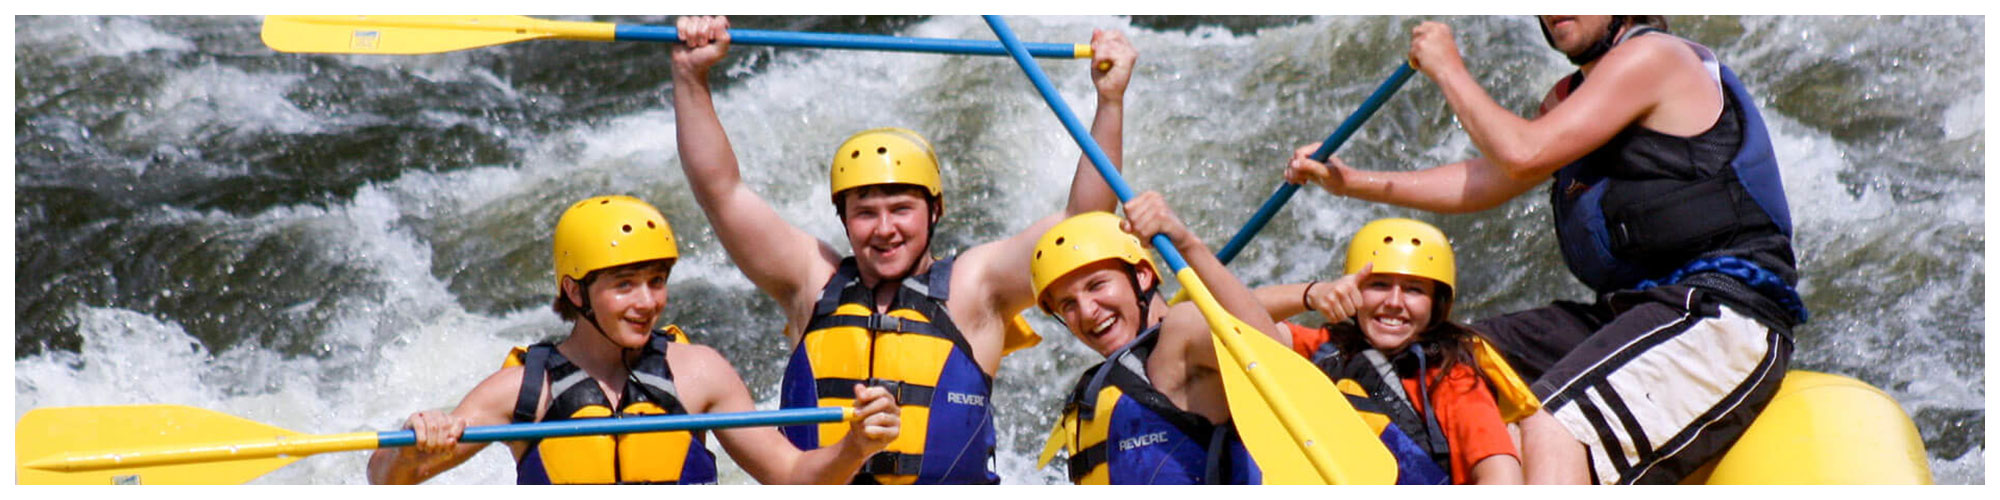 Rafting in the Smokies (Header Background) | Gatlinburg Attractions